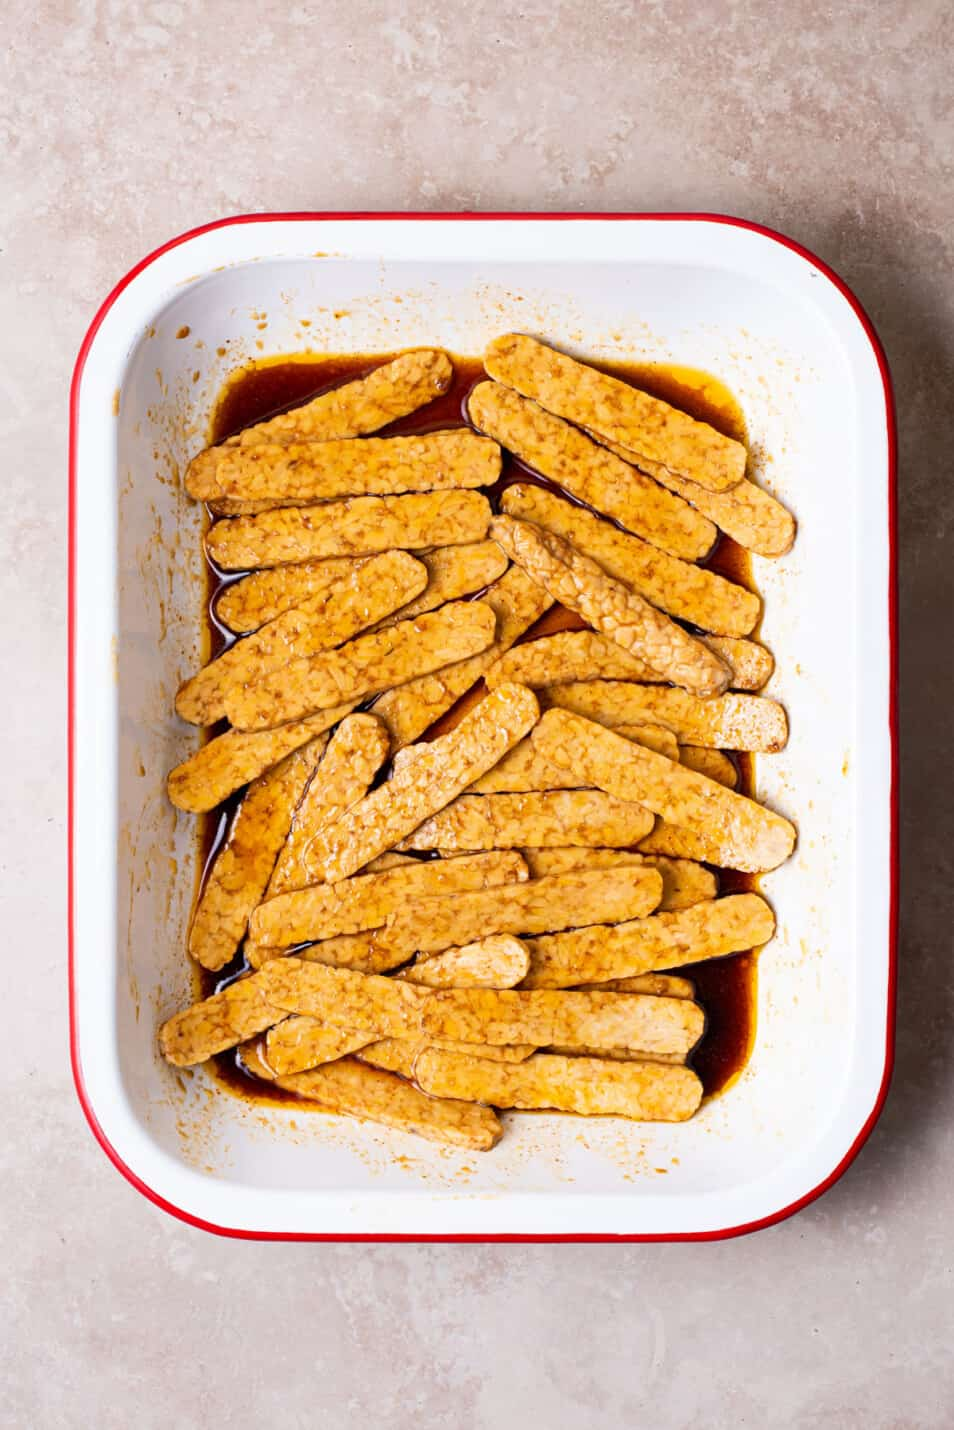 Tempeh strips marinating in an enamel dish.